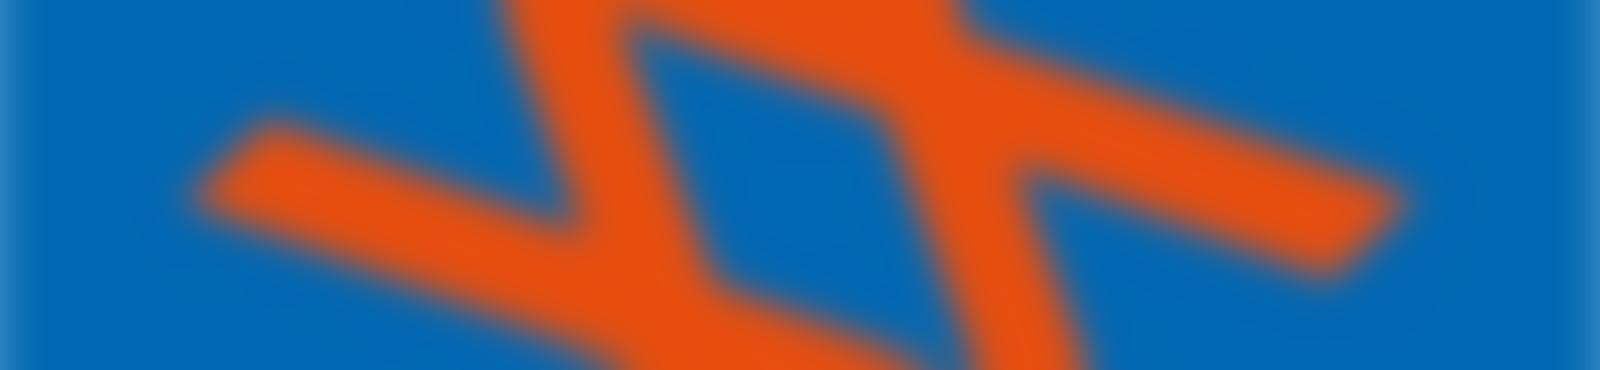 Blurred fc4b9d30 8e92 439f 8cce e908aa19311a